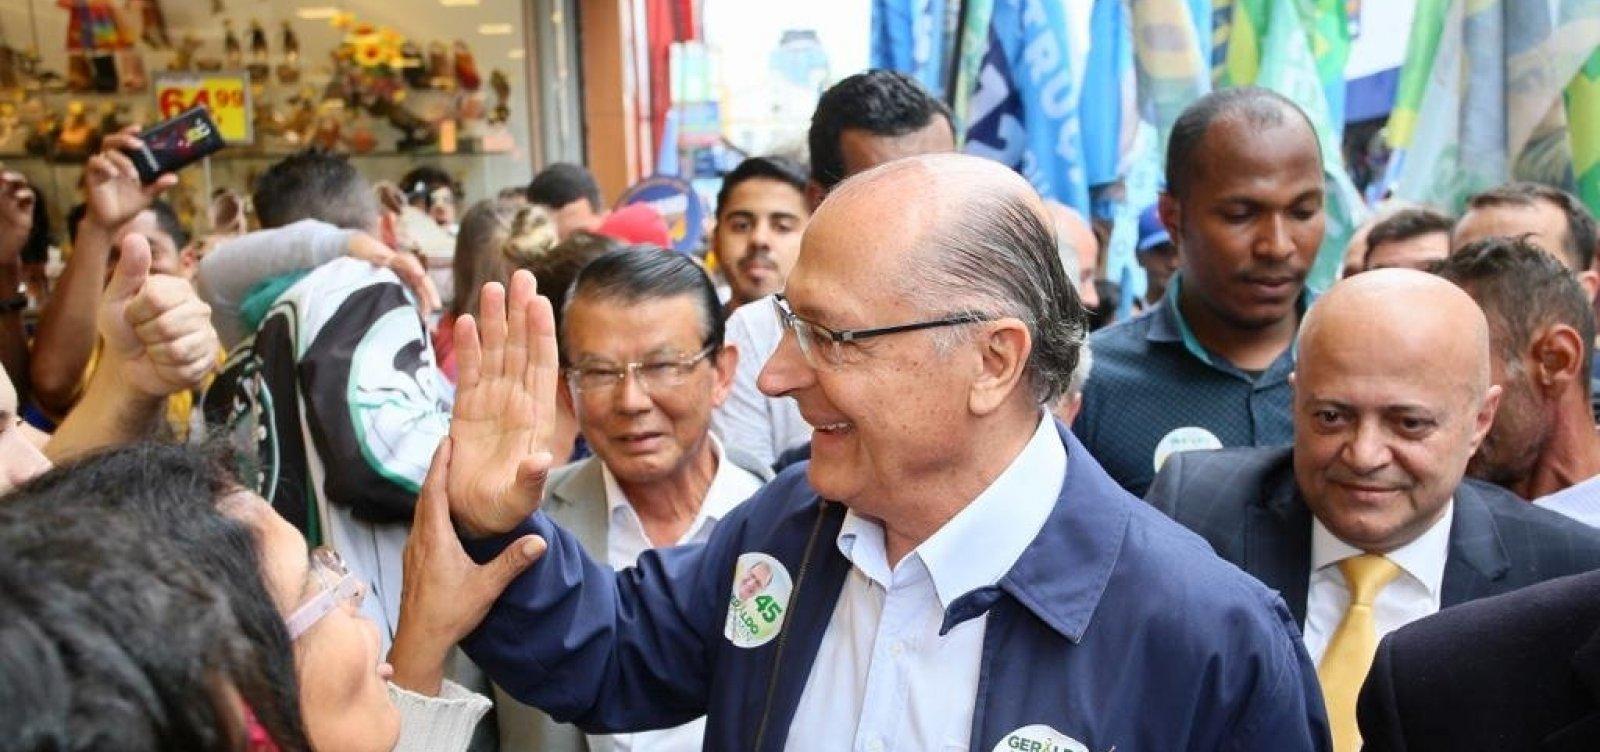 [MP vai apurar se decretos assinados por Alckmin beneficiaram familiares]